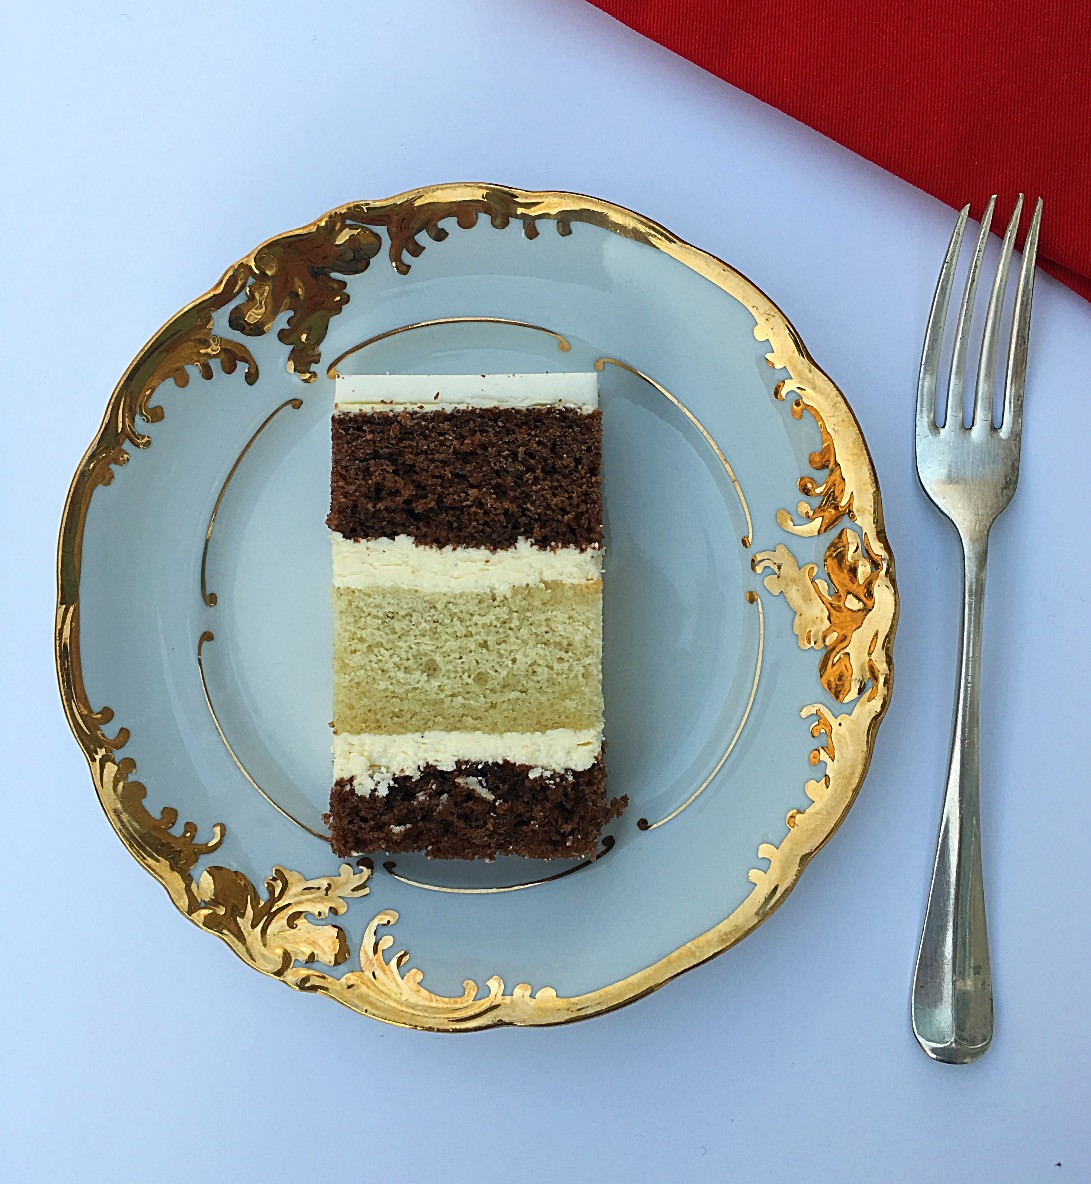 Chocolate and vanilla sponge